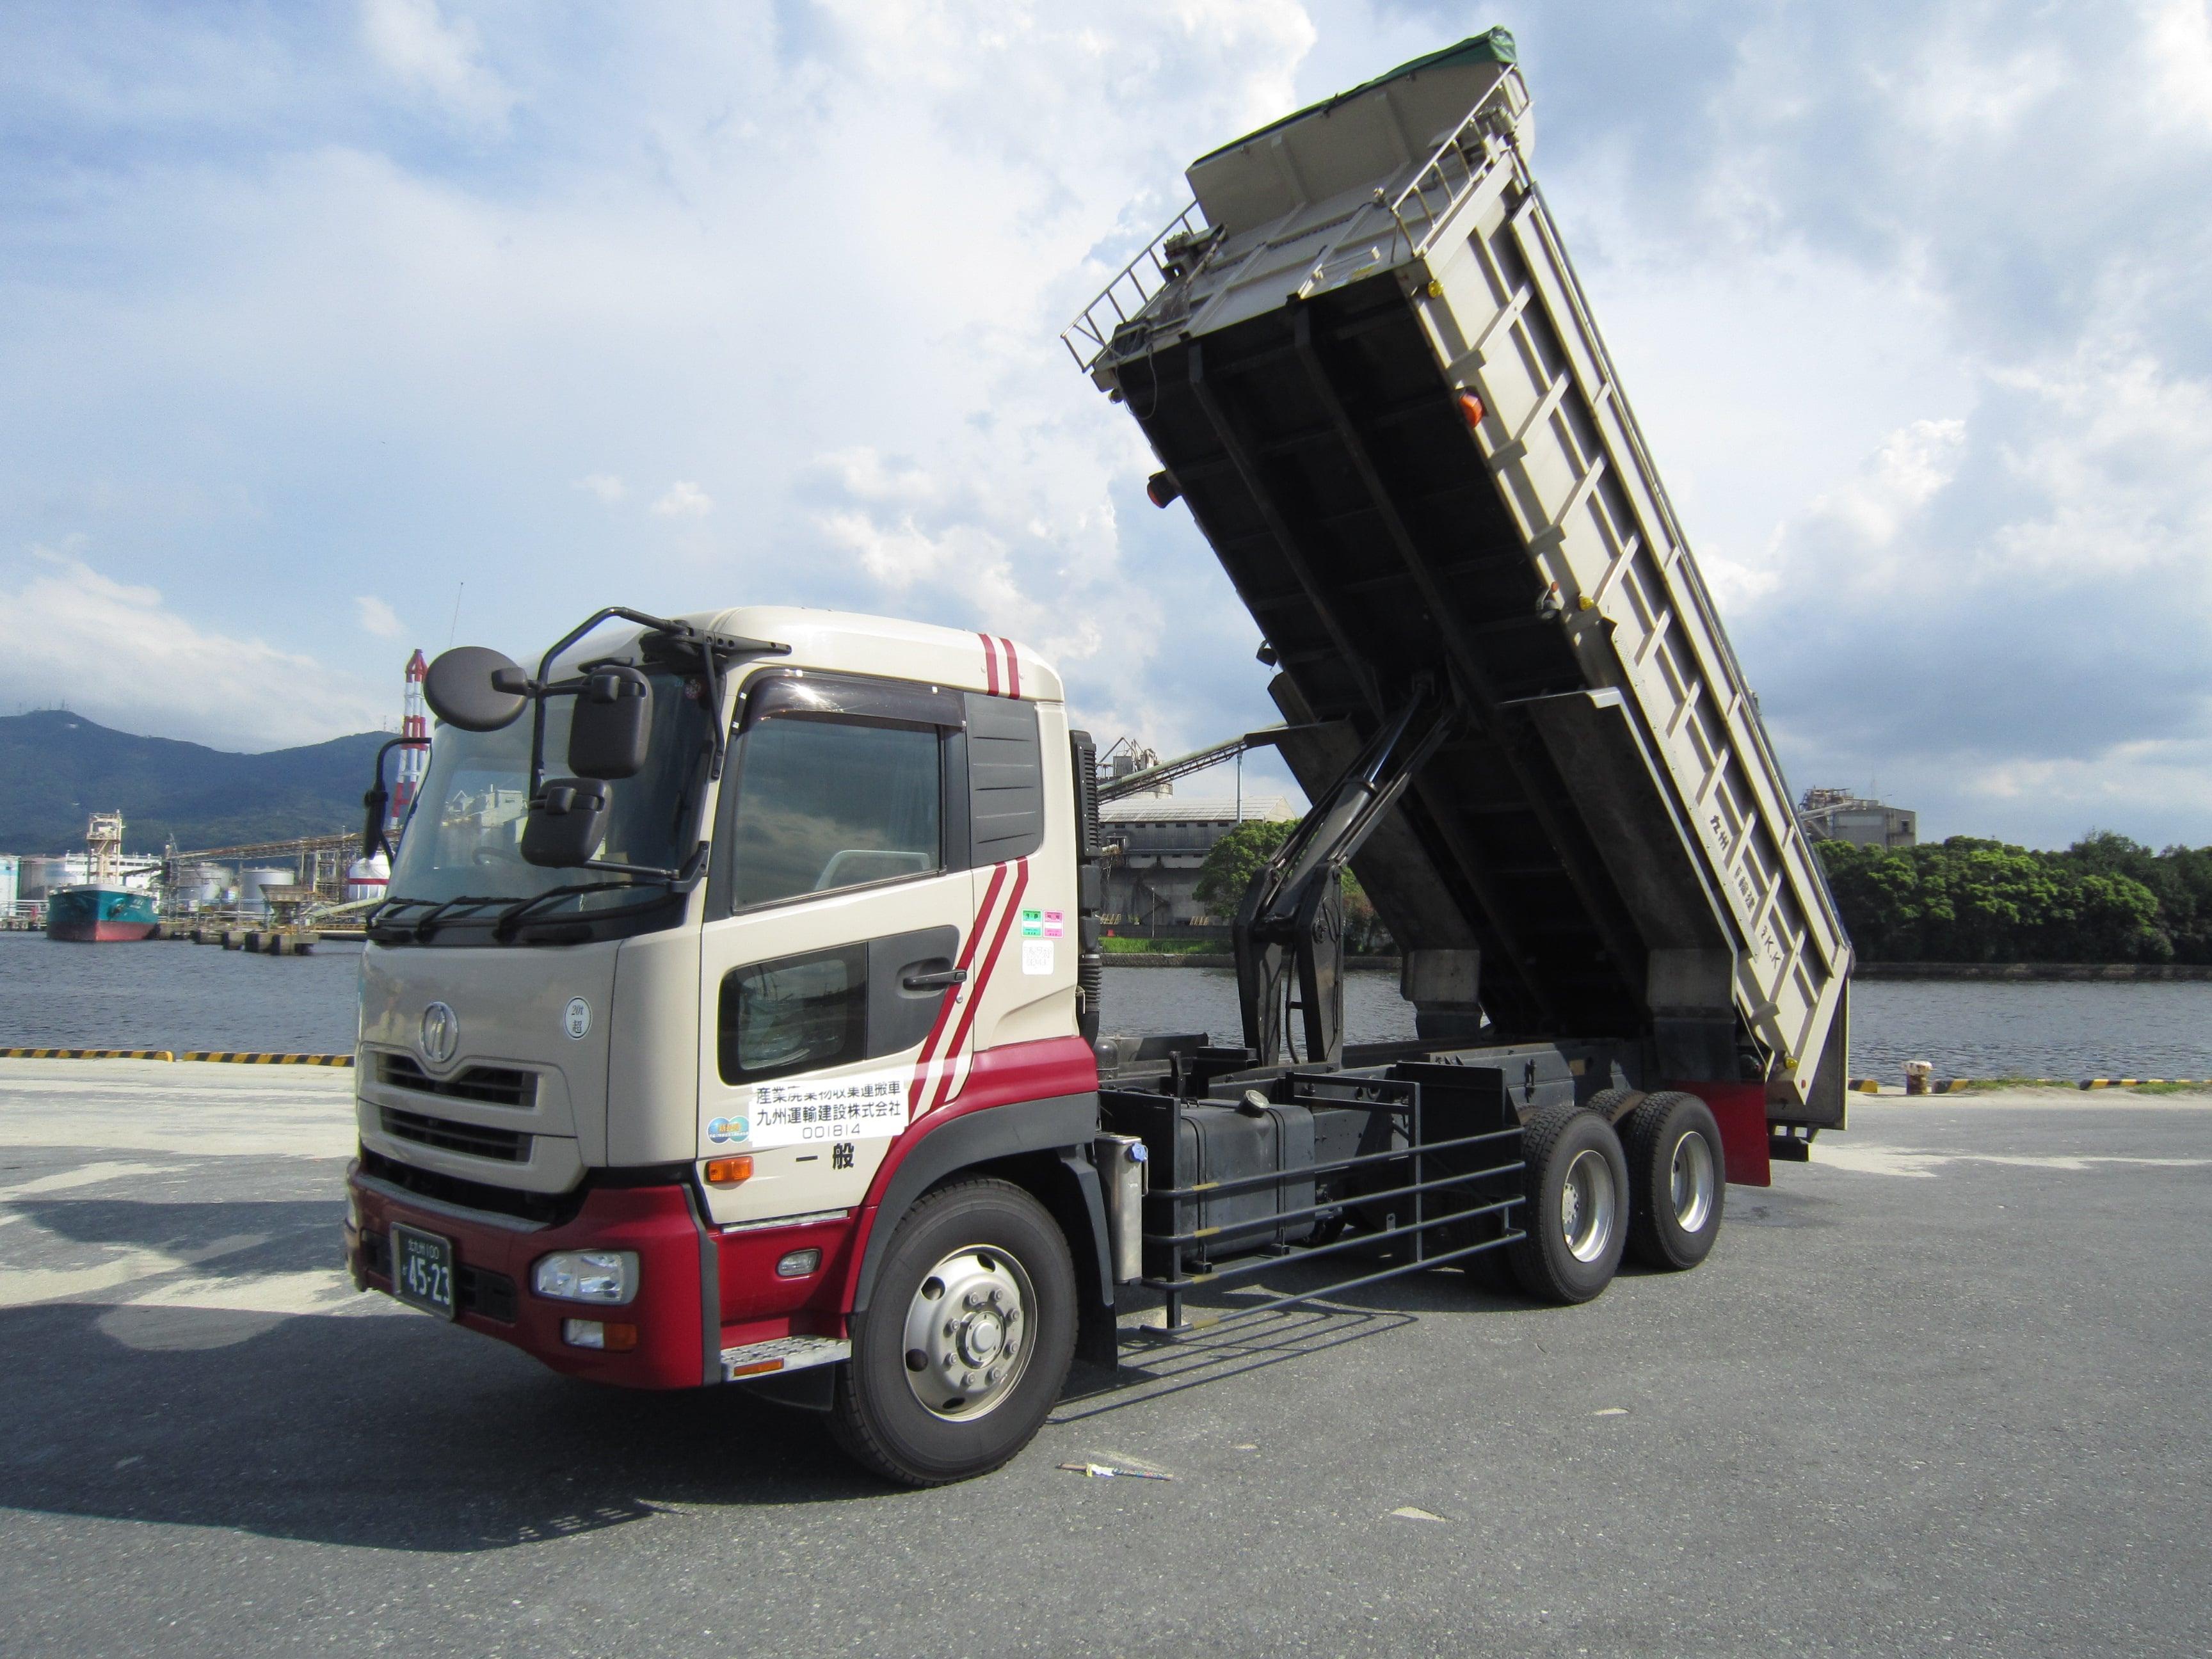 10tダンプ|産業廃棄物収集運搬|九州運輸建設株式会社|北九州市